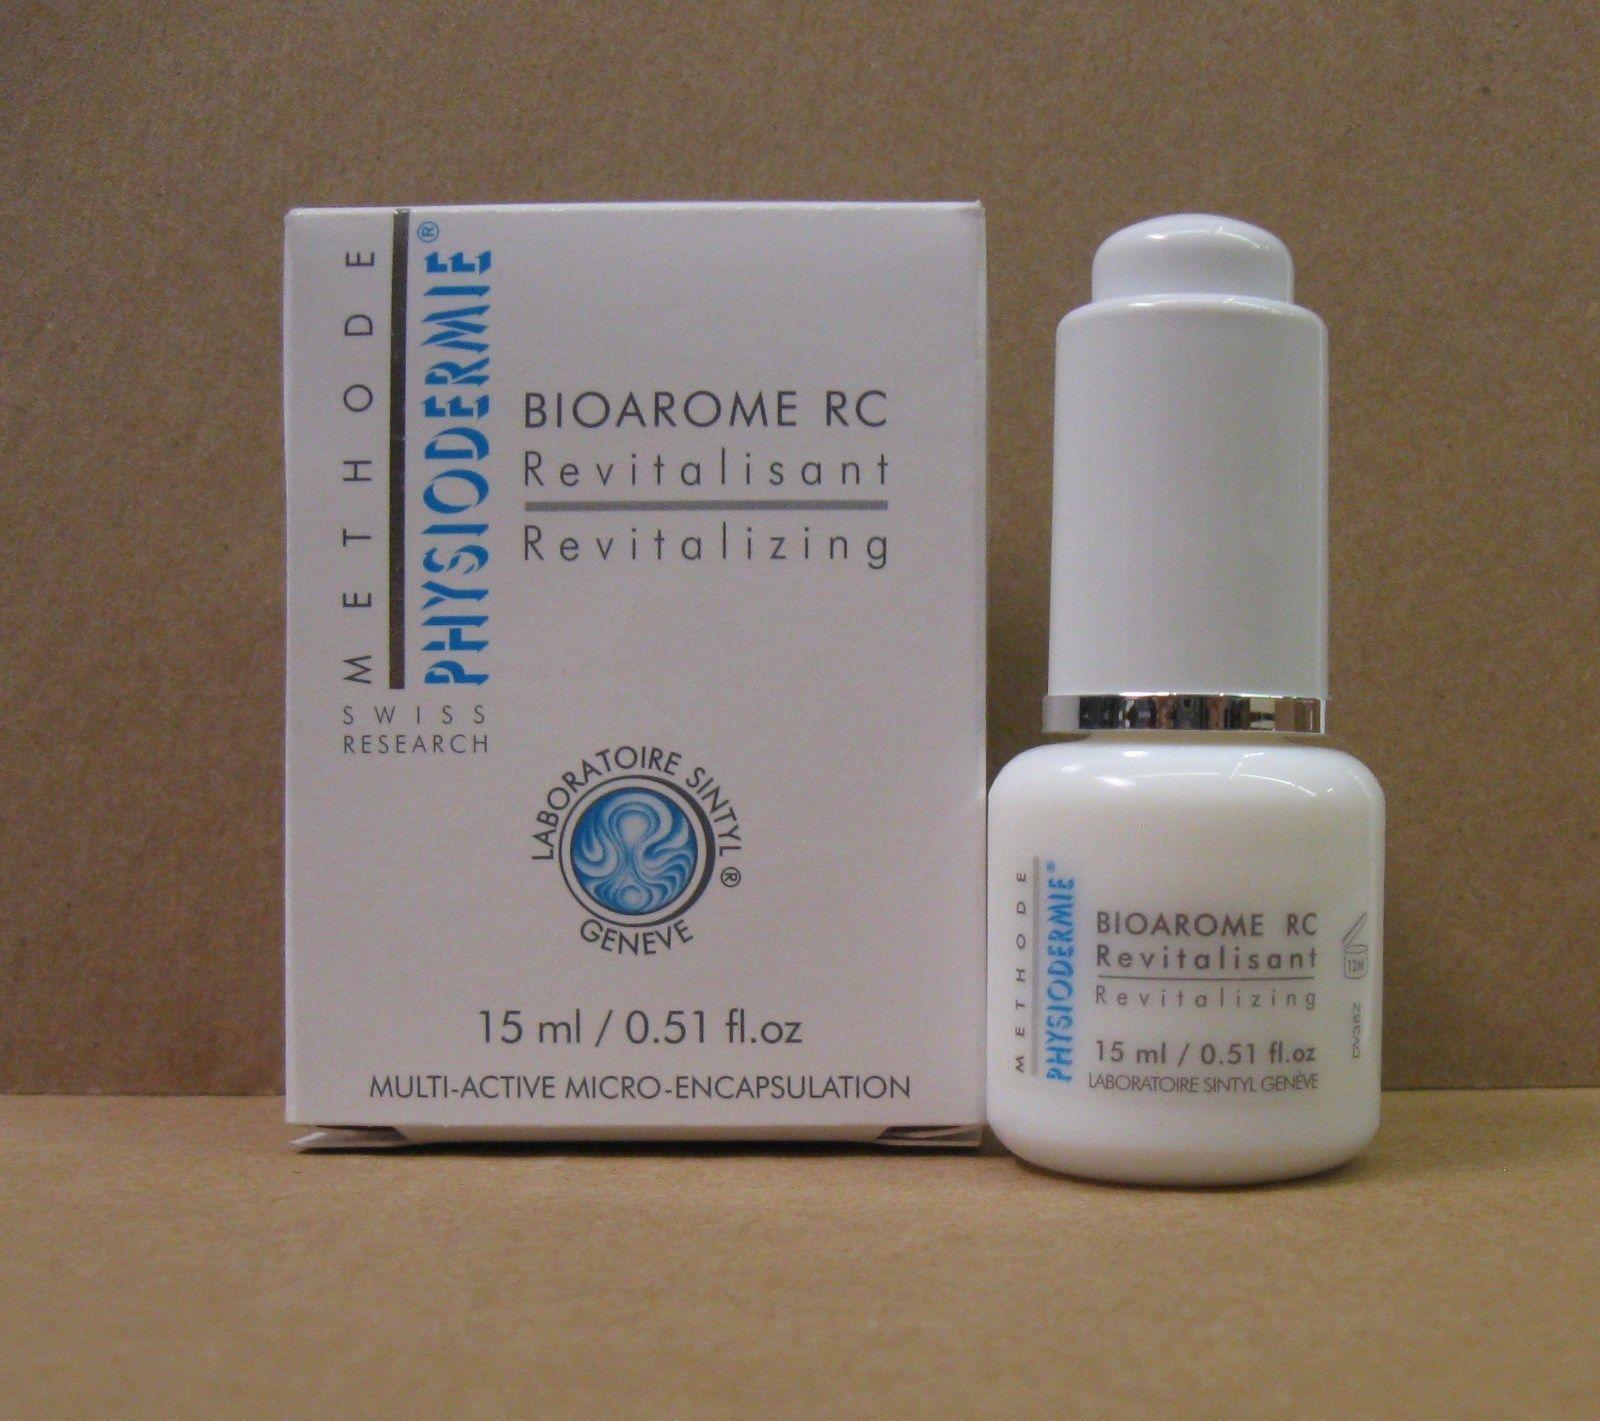 Physiodermie Bioarome RC Revitalizing - 15 ml / 0.51 oz. - New in Box - $53.28